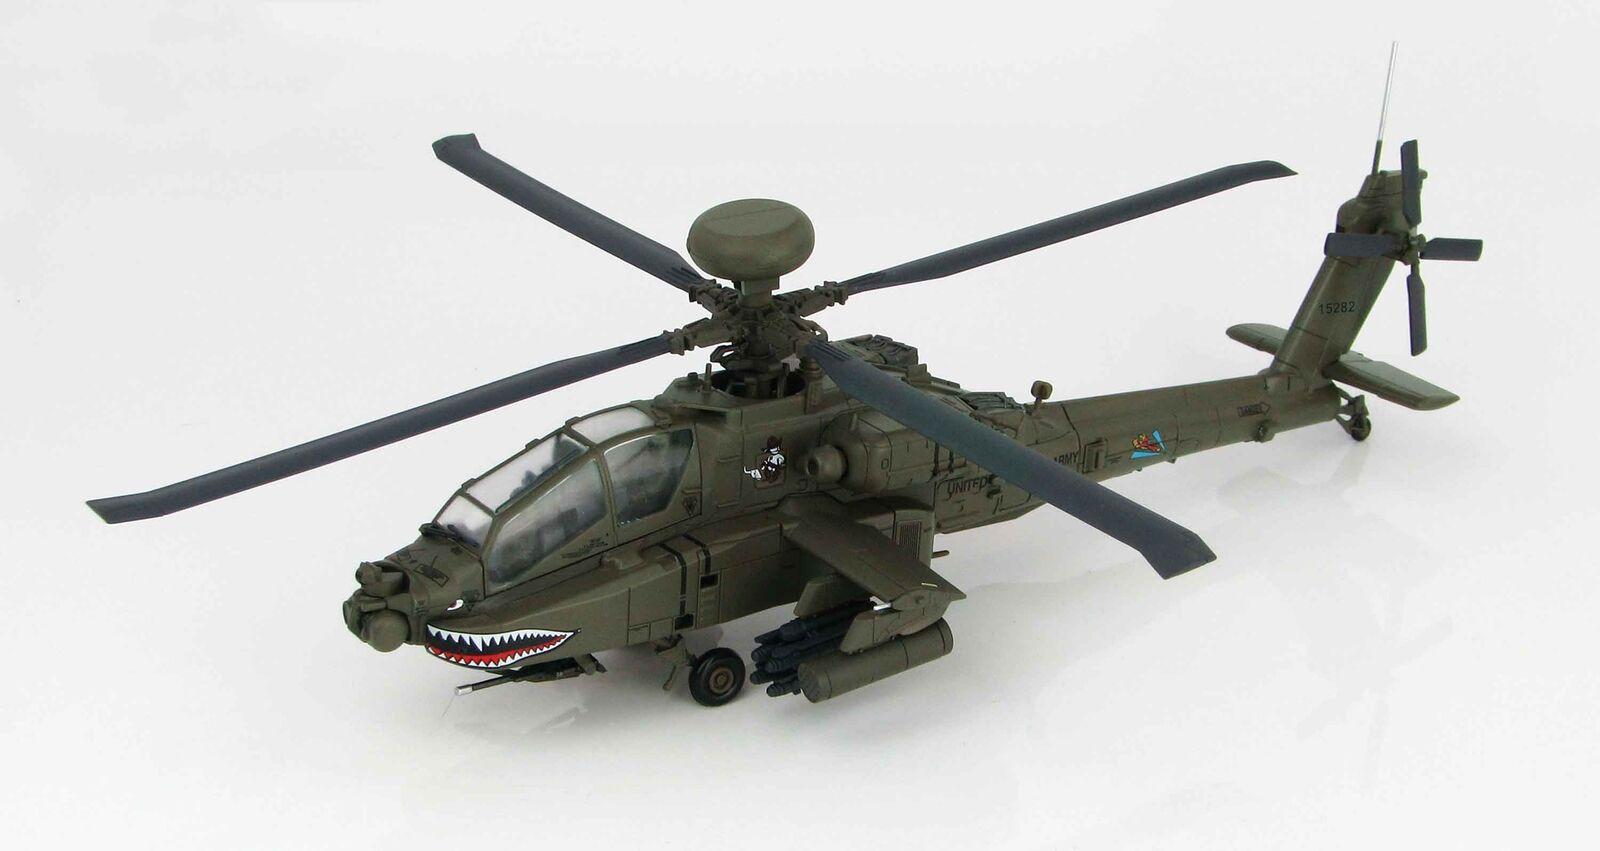 Hobby Master 1201 AH-64D 8th BN 229th aviación regimiento del ejército de Estados Unidos 1/72 Escala Modelo